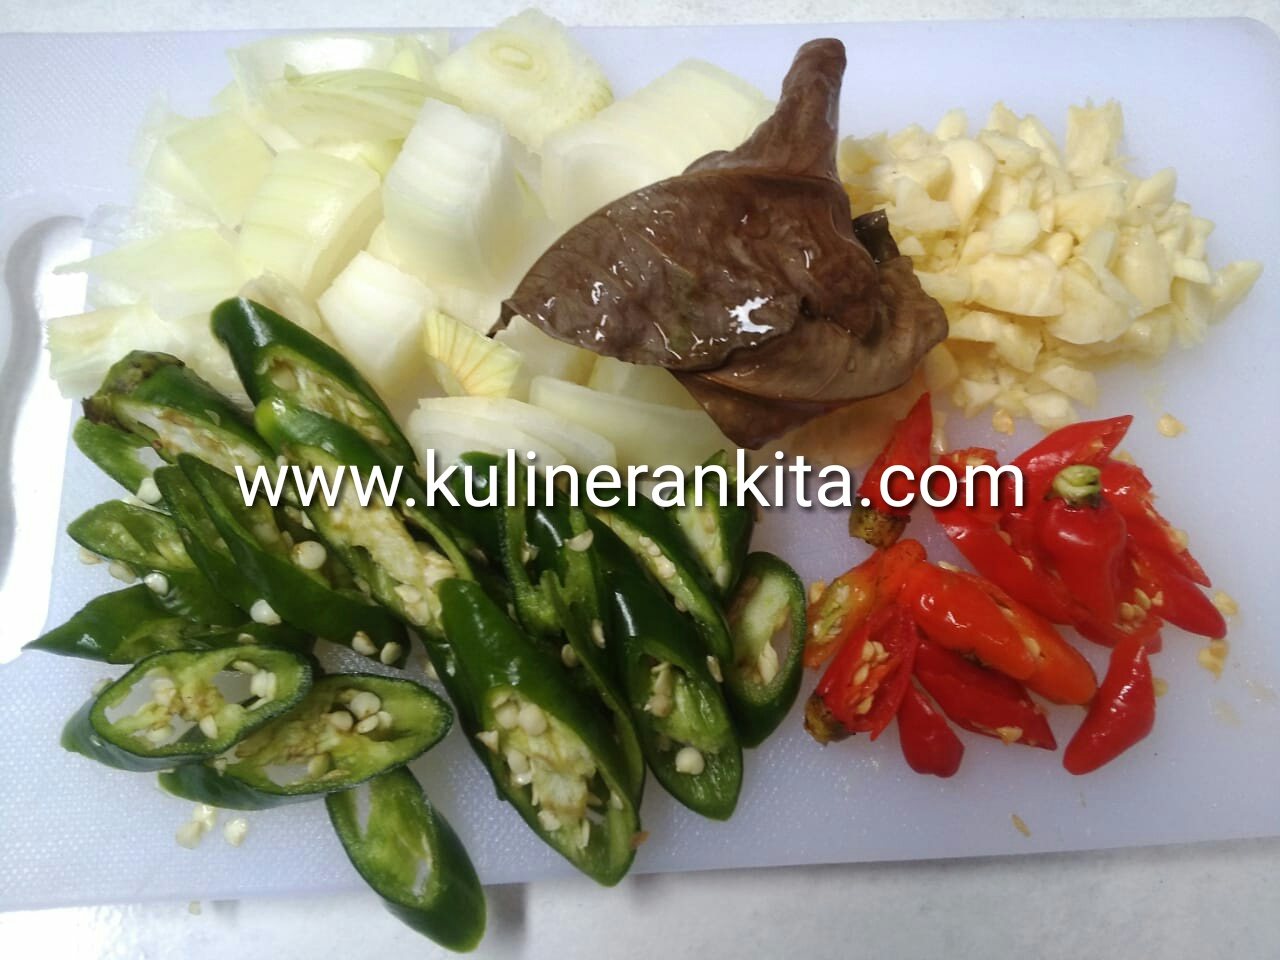 kulinerankita.com Resep Daging Se'i Sapi Saos Lada Hitam Kota Kupang